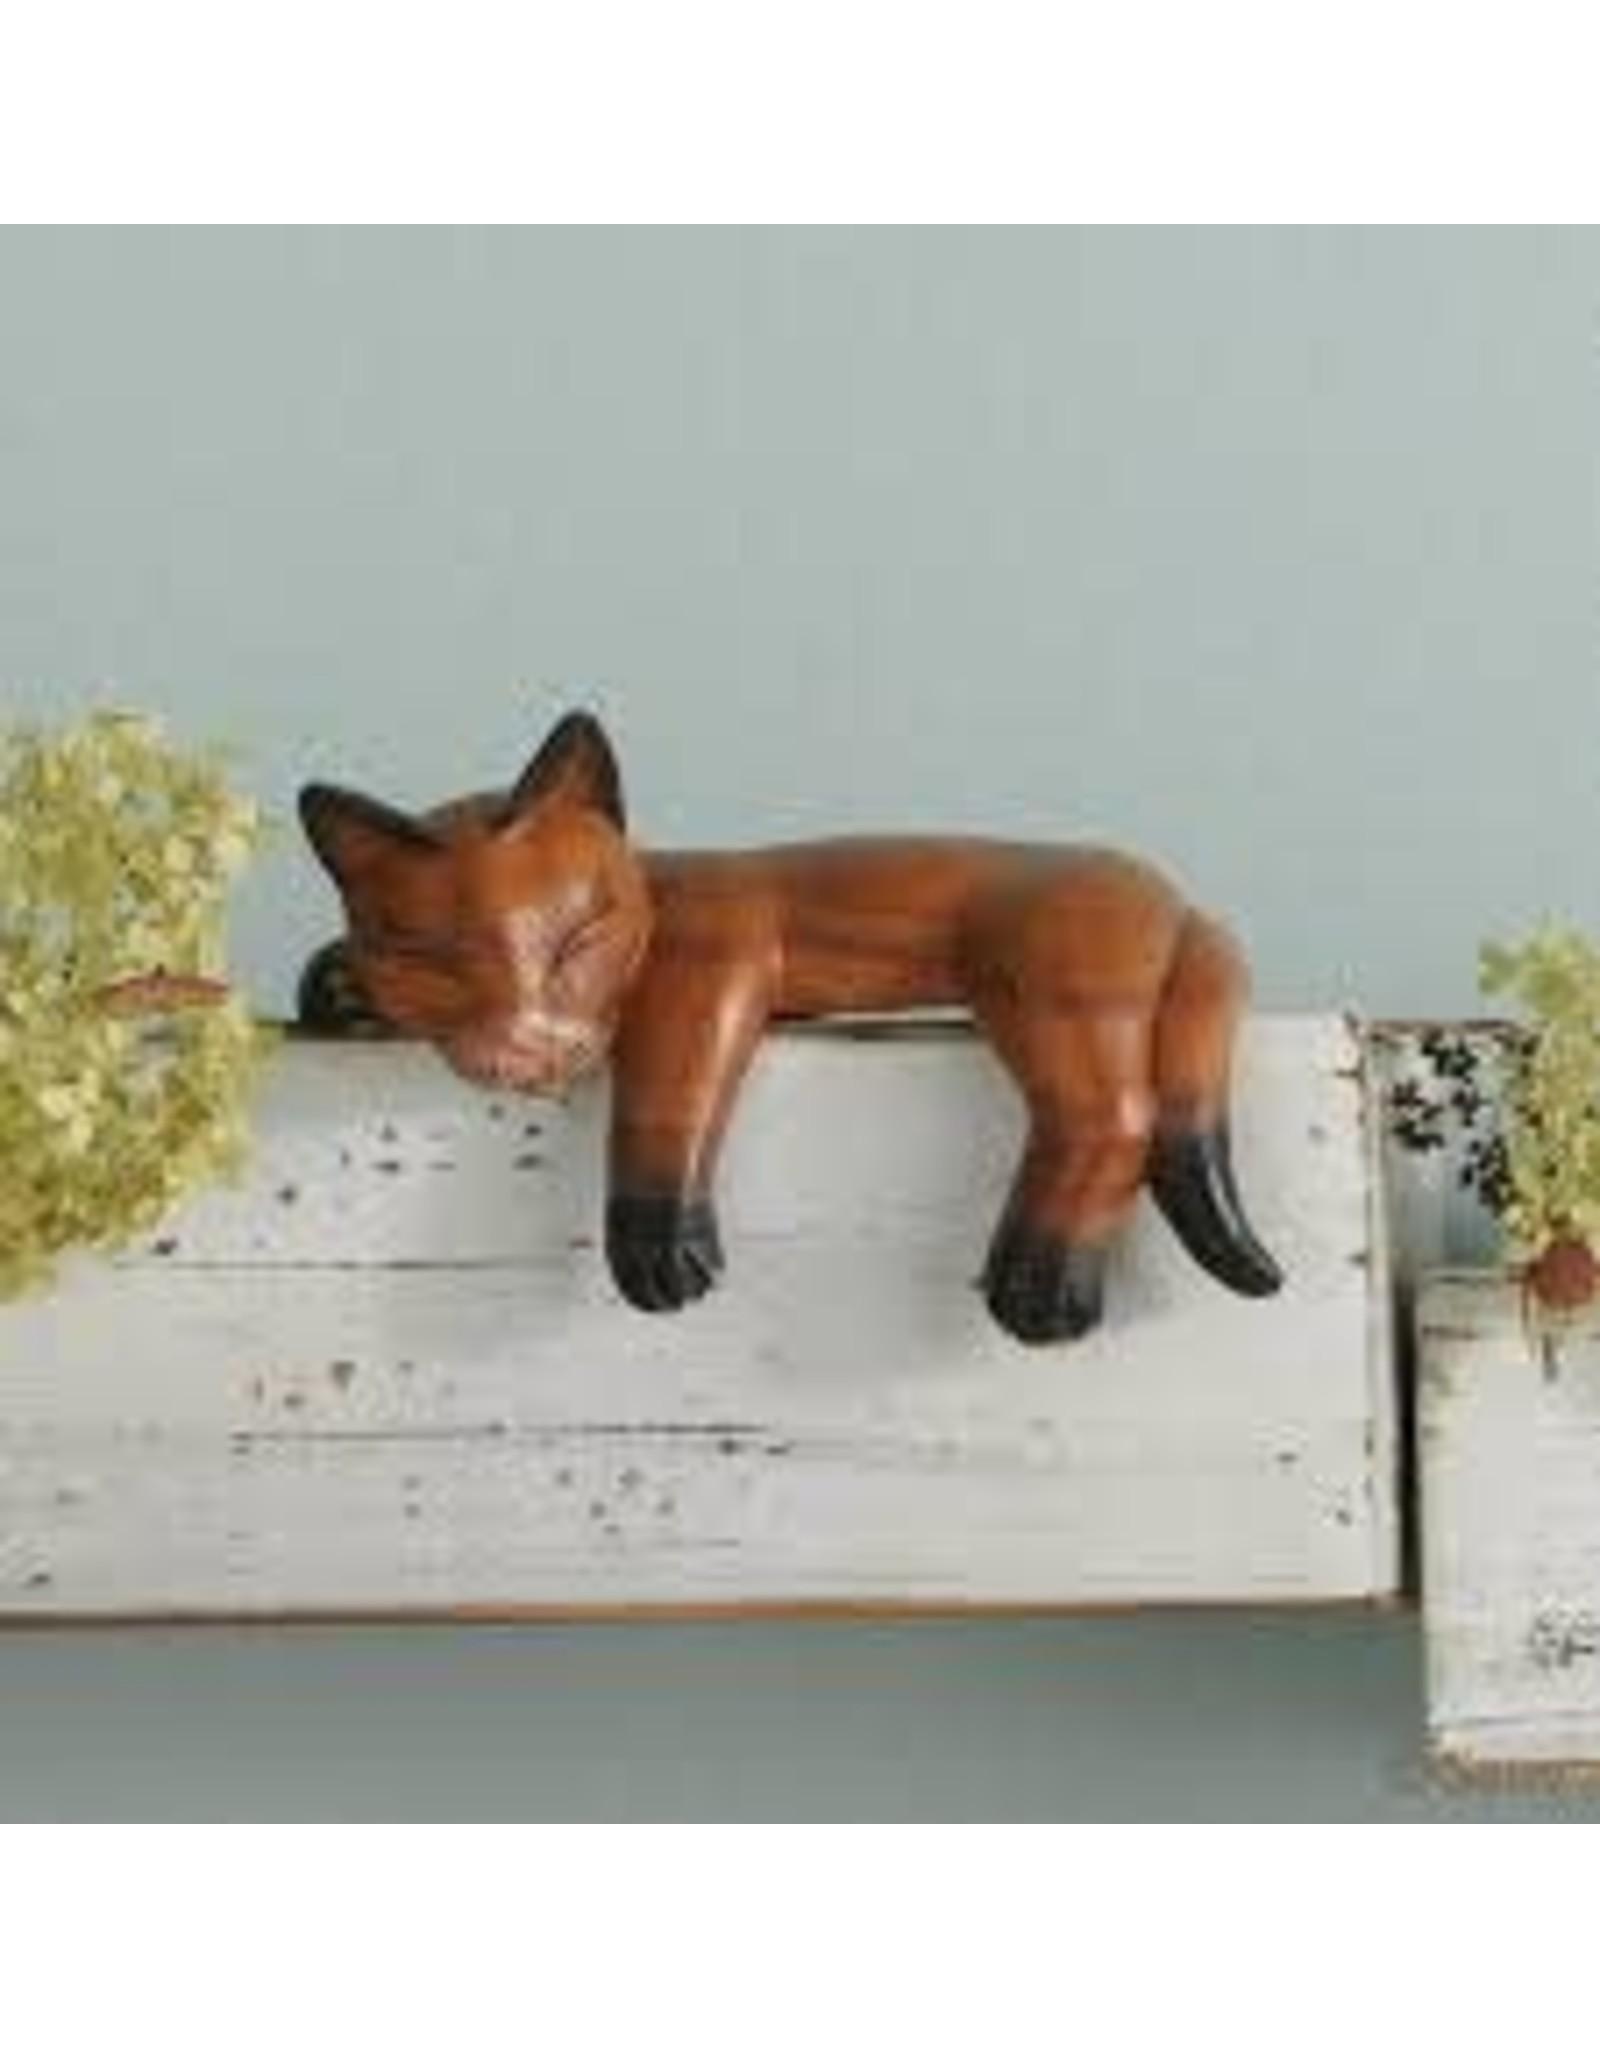 Napping Shelf Cat, India